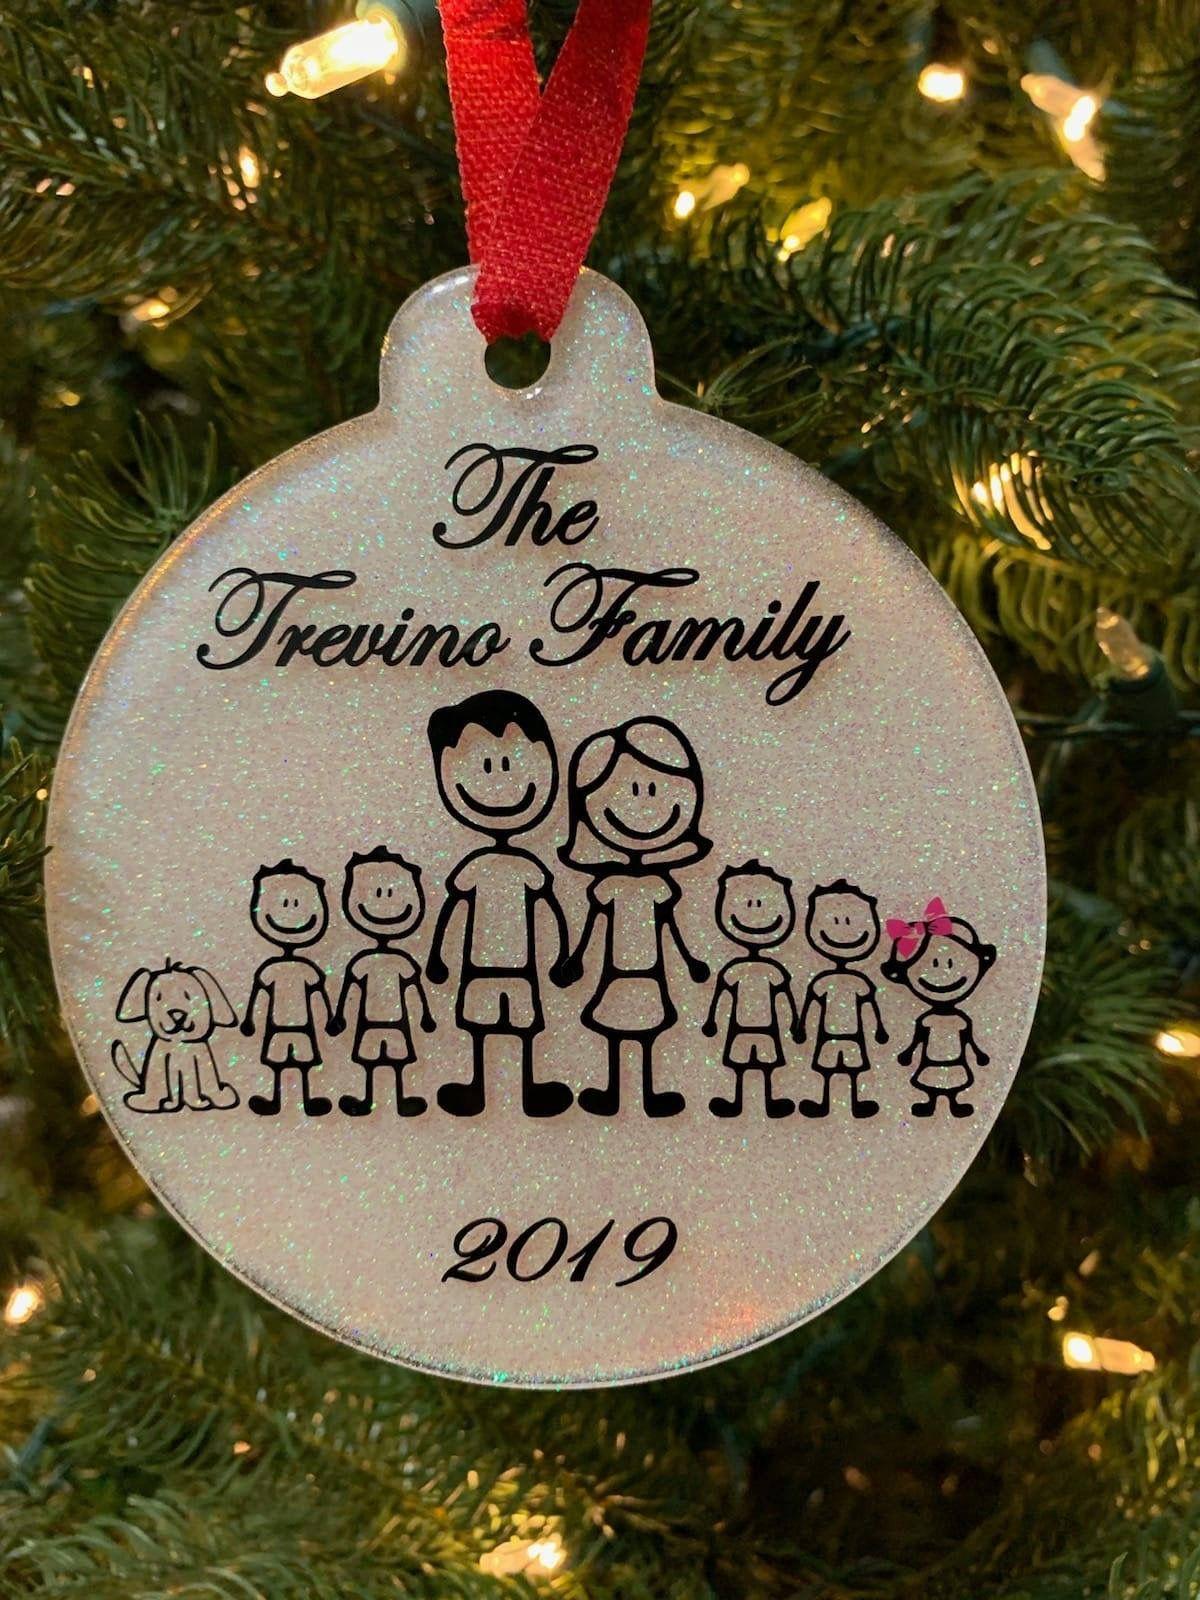 Pin By Linda Olivo On Cricut Christmas Ideas In 2020 Cricut Christmas Ideas Christmas Ornaments Diy Christmas Ornaments